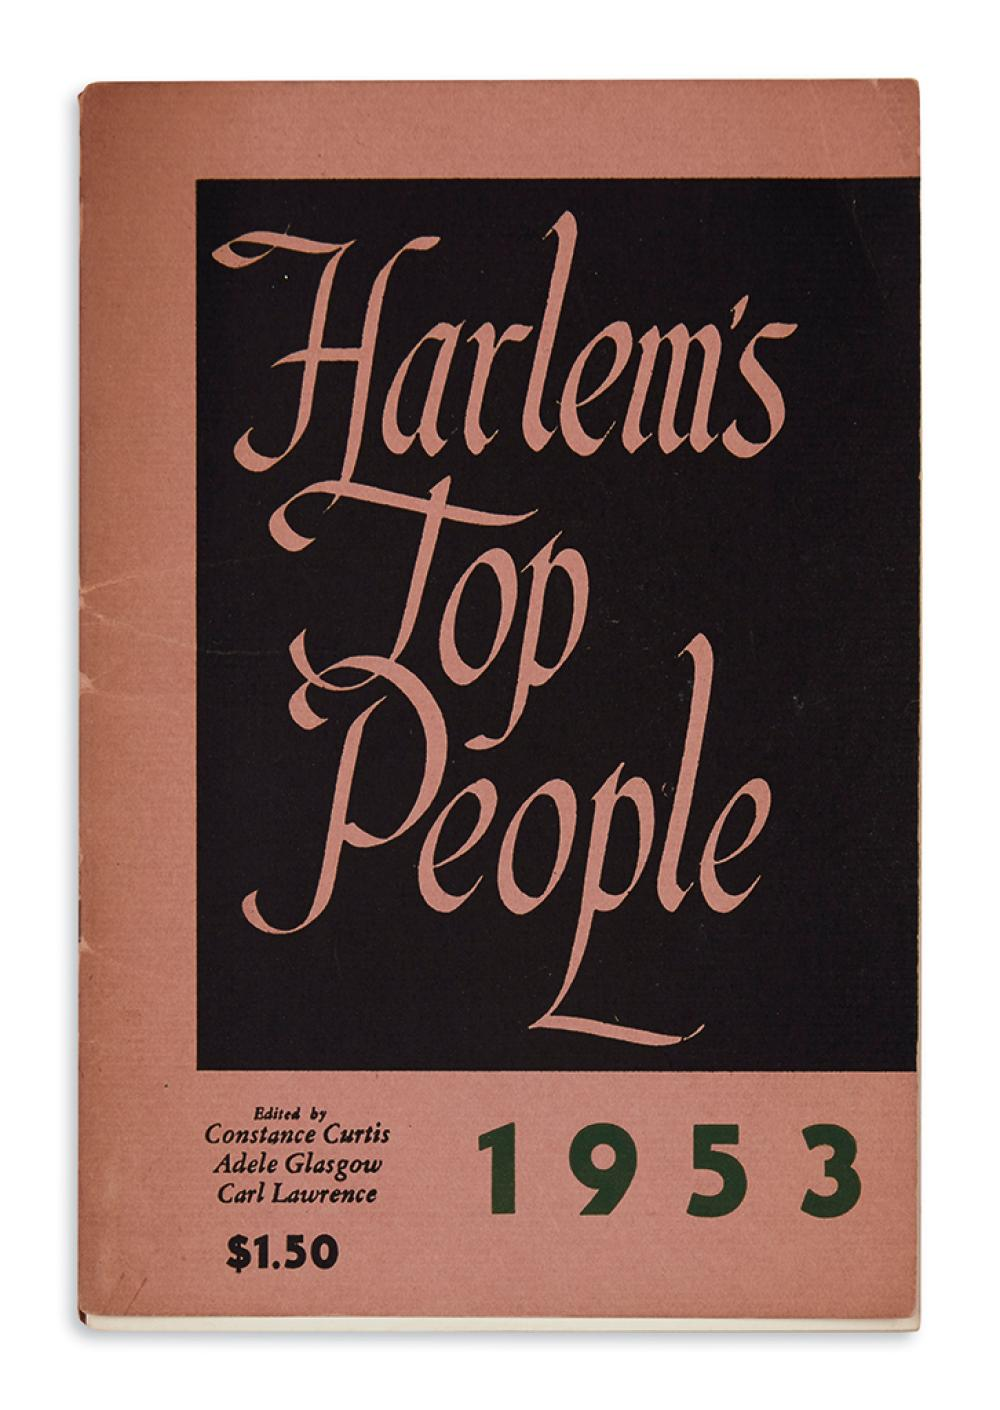 (BUSINESS.) Curtis, Constance, et al; editors. Harlem's Top People, 1953.